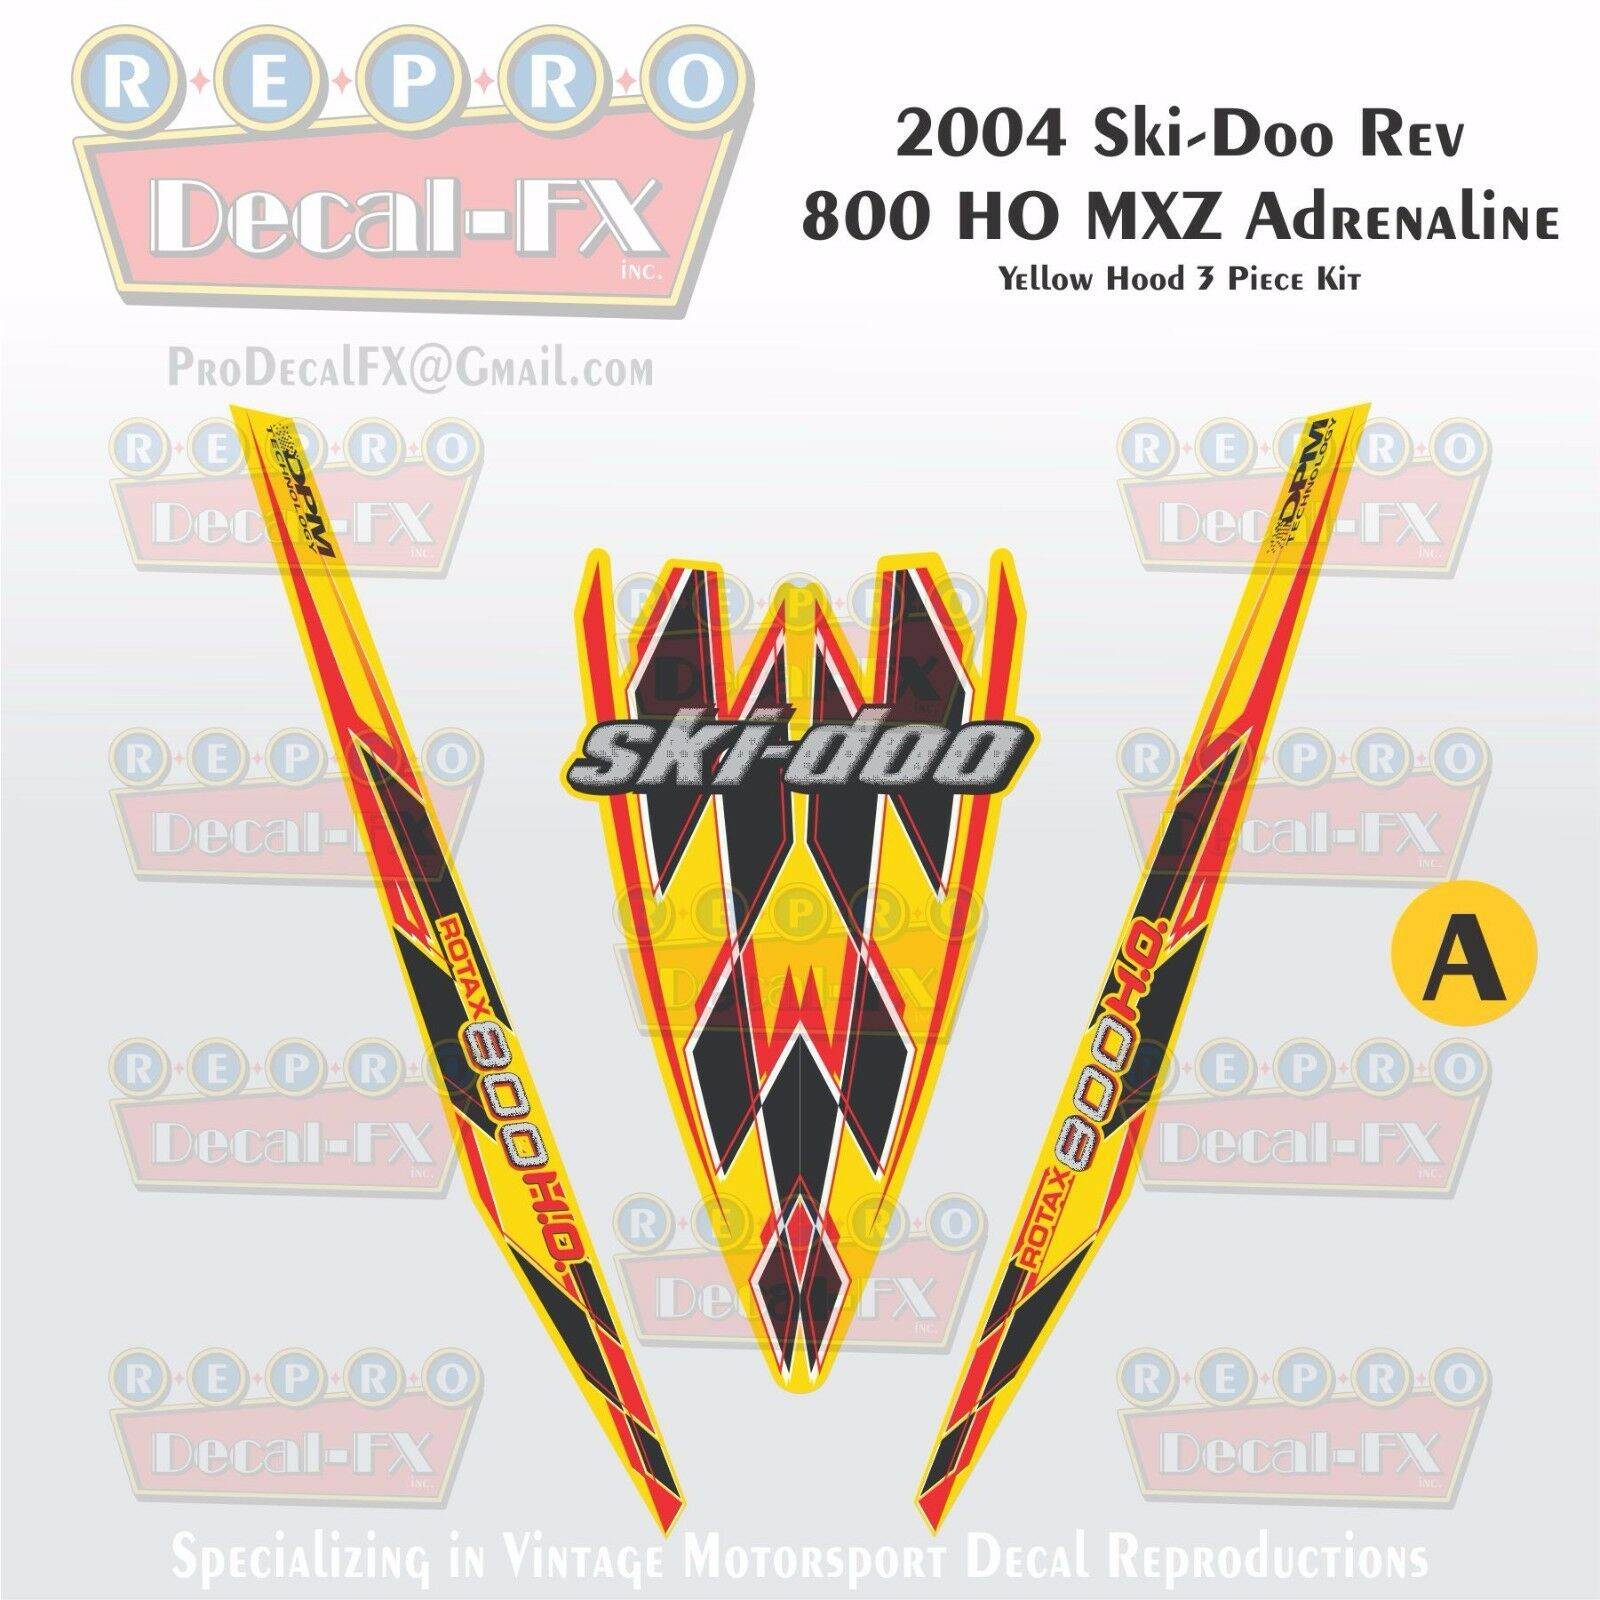 2004 Ski-doo Rev MXZ 800HO Yellow Hood Panel Reproduction Vinyl Decal Set 3Pc